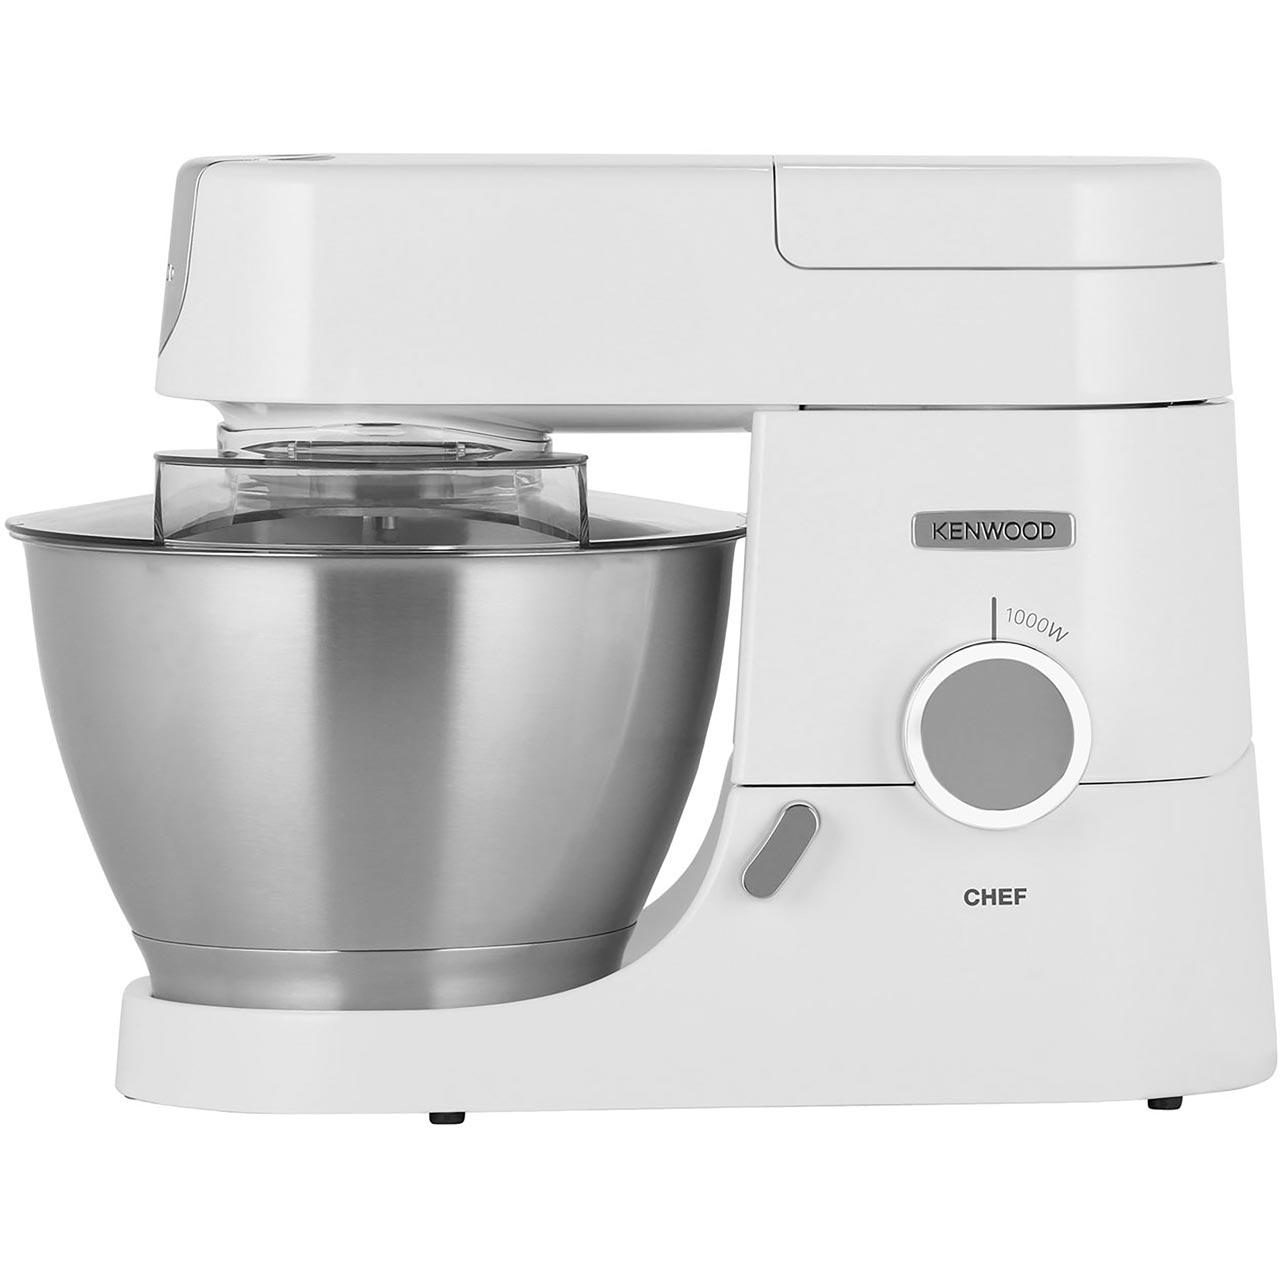 Kenwood Chef KVC3100W Kitchen Machine review